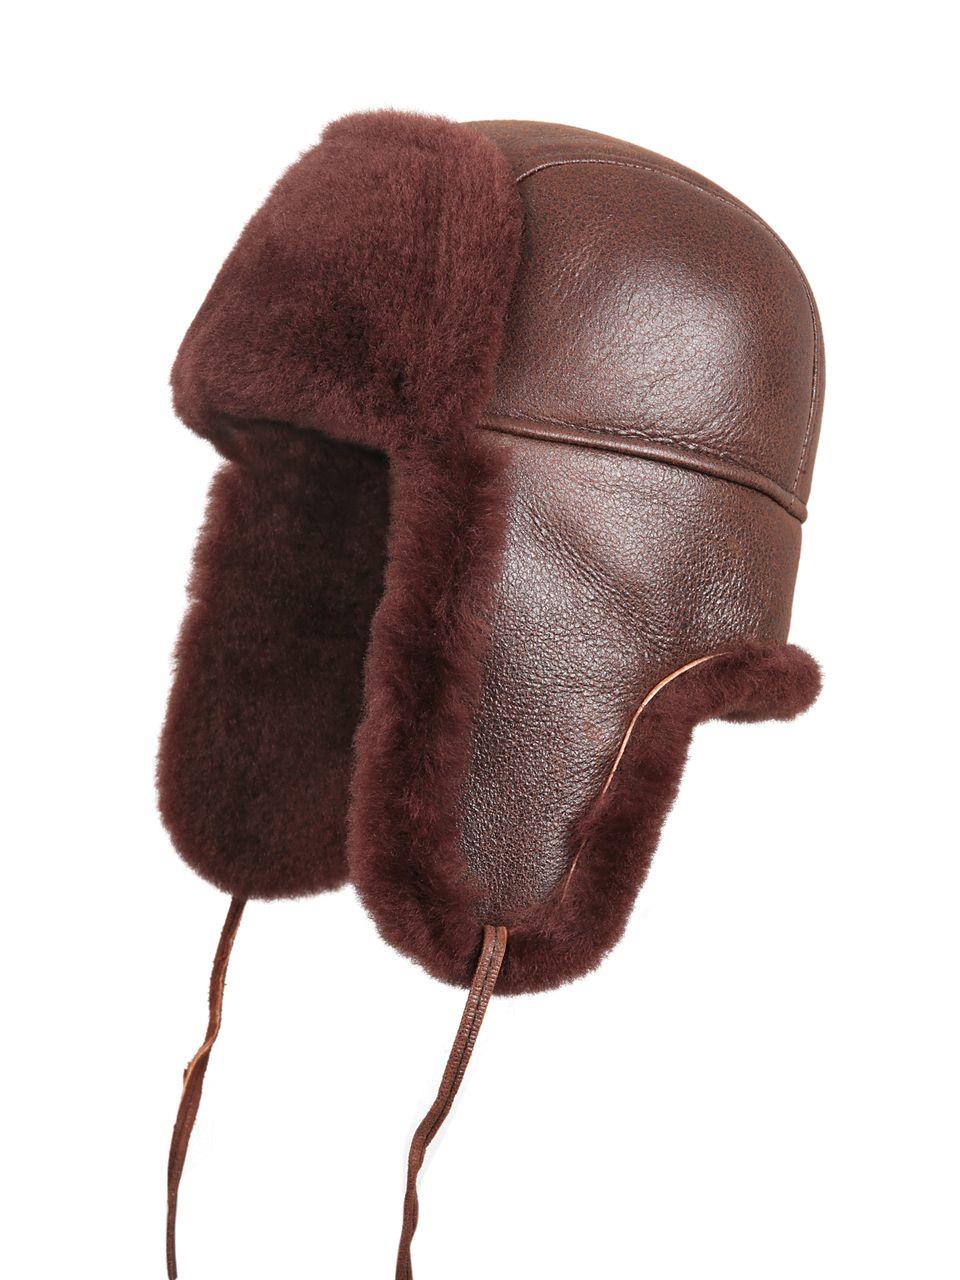 Zavelio Shearling Sheepskin Aviator Fur Hat - Brick Color f65baf903f8a